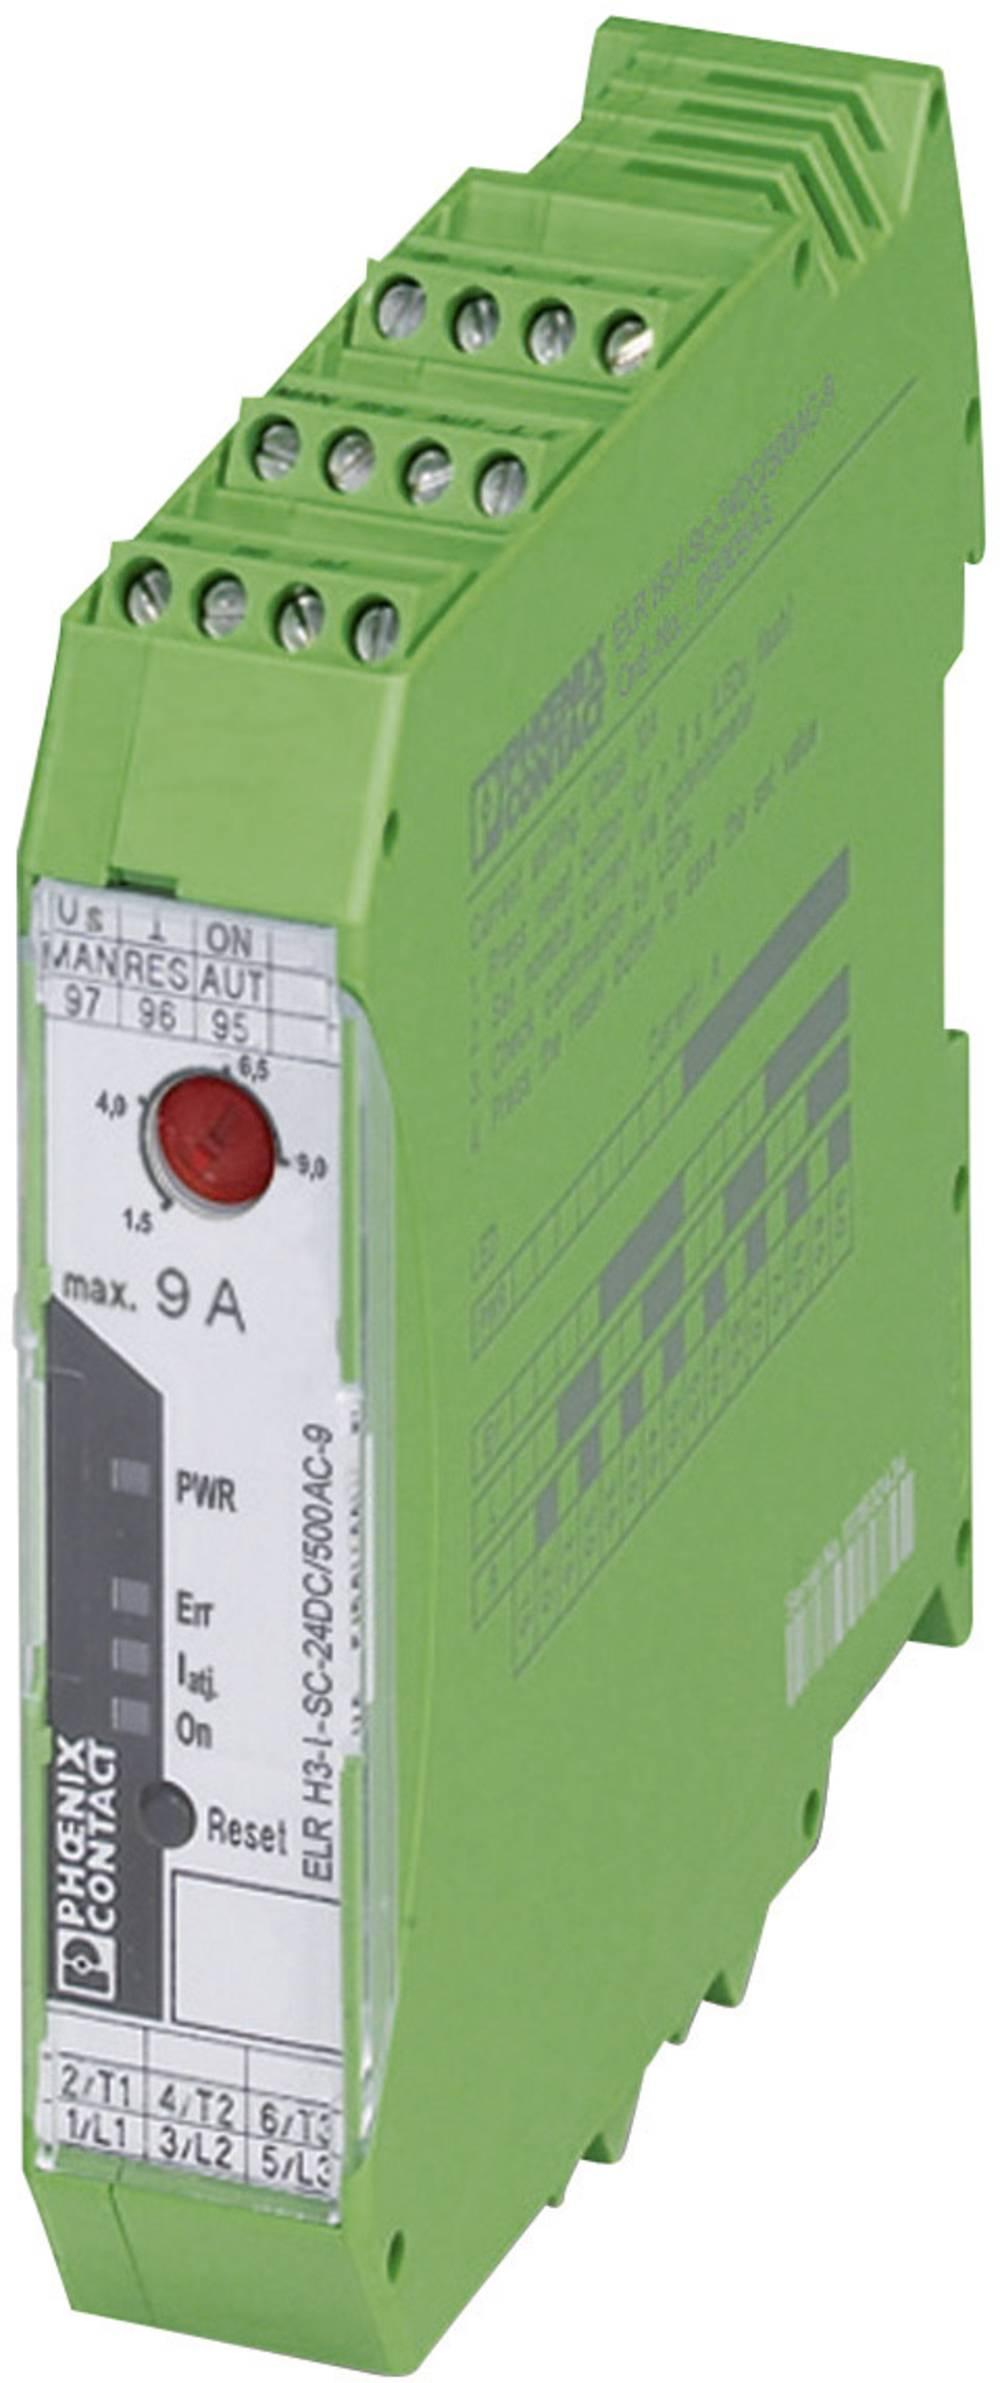 Zaščita motorja 1 kos ELR H3-I-SC-230AC/500AC-2 Phoenix Contact bremenski tok: 2.4 A preklopna napetost (maks.): 550 V/AC